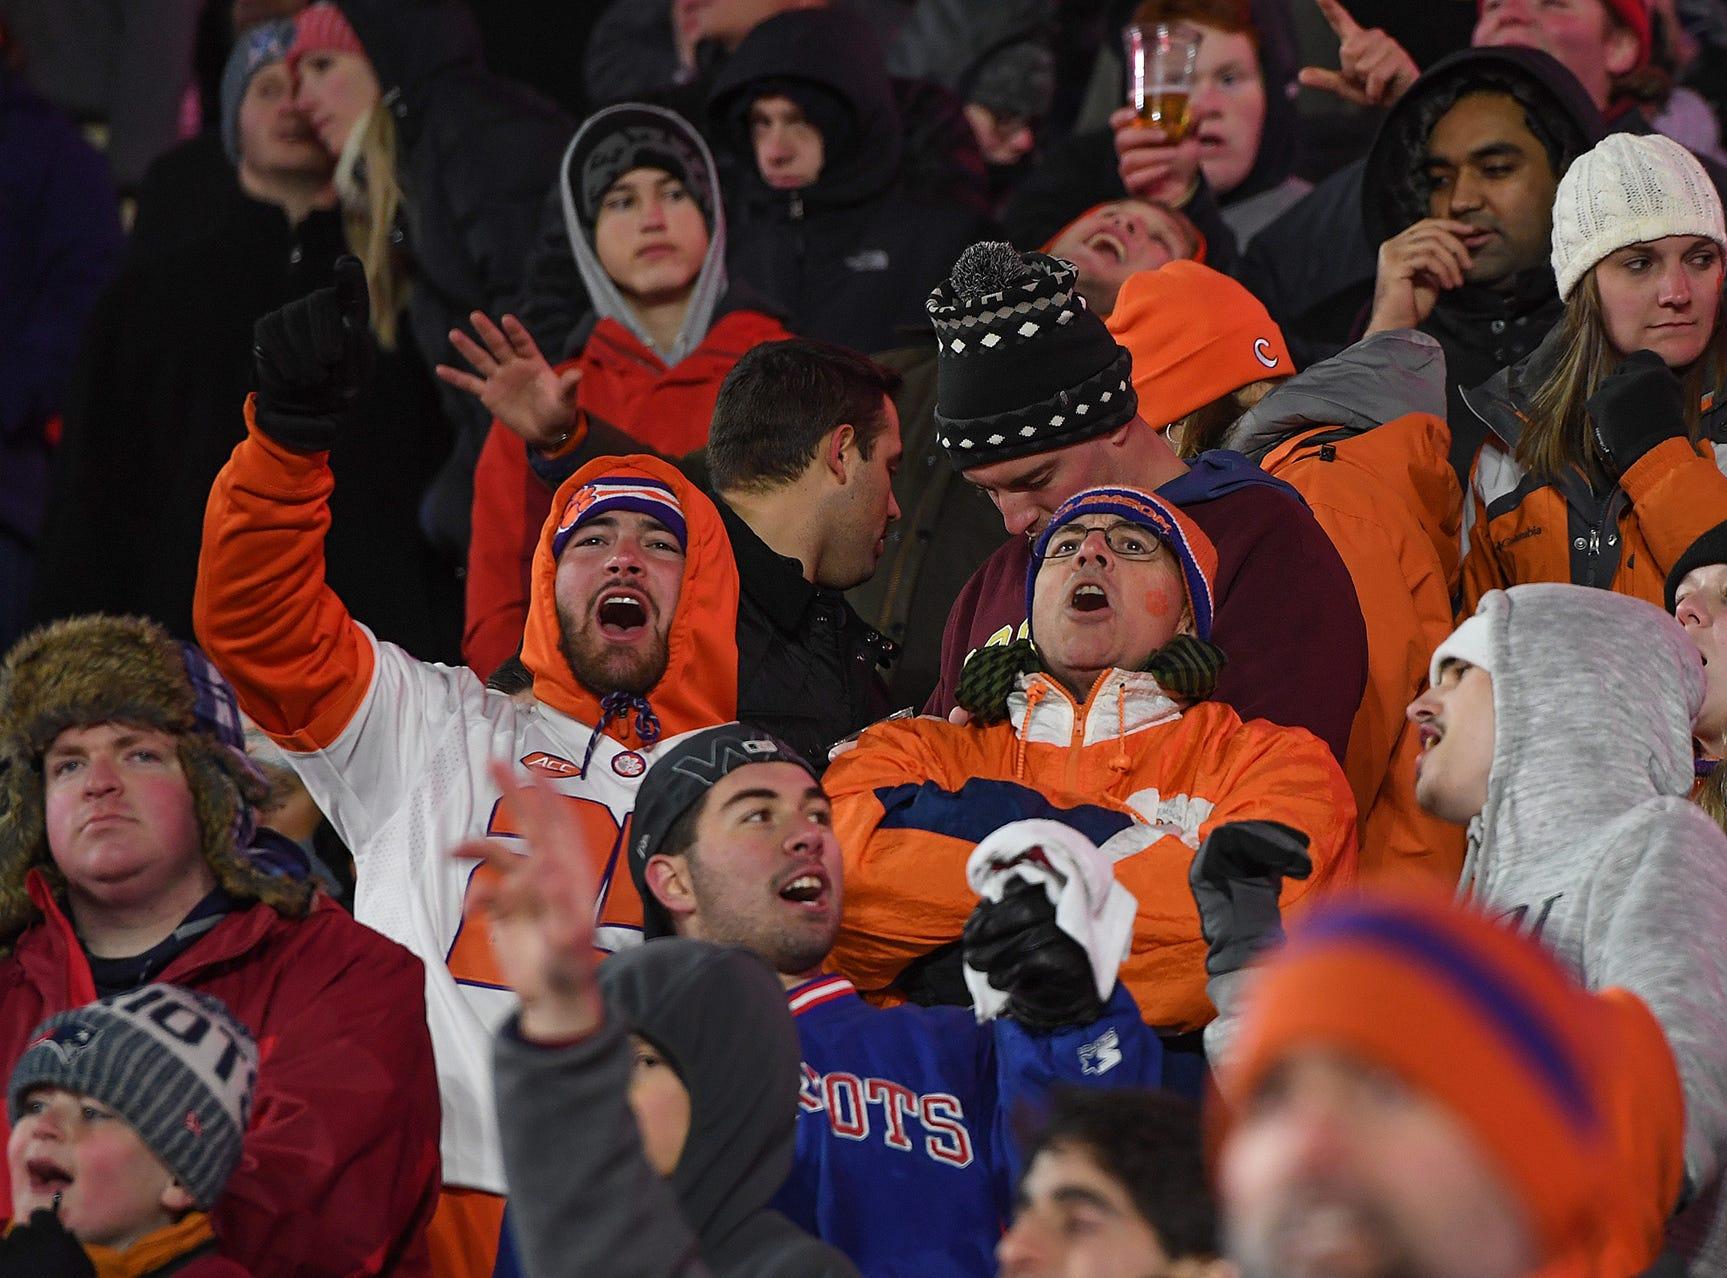 Clemson fans during the 4th quarter at Boston College's Alumni Stadium in Chestnut Hill, MA. Saturday, November 10, 2018.